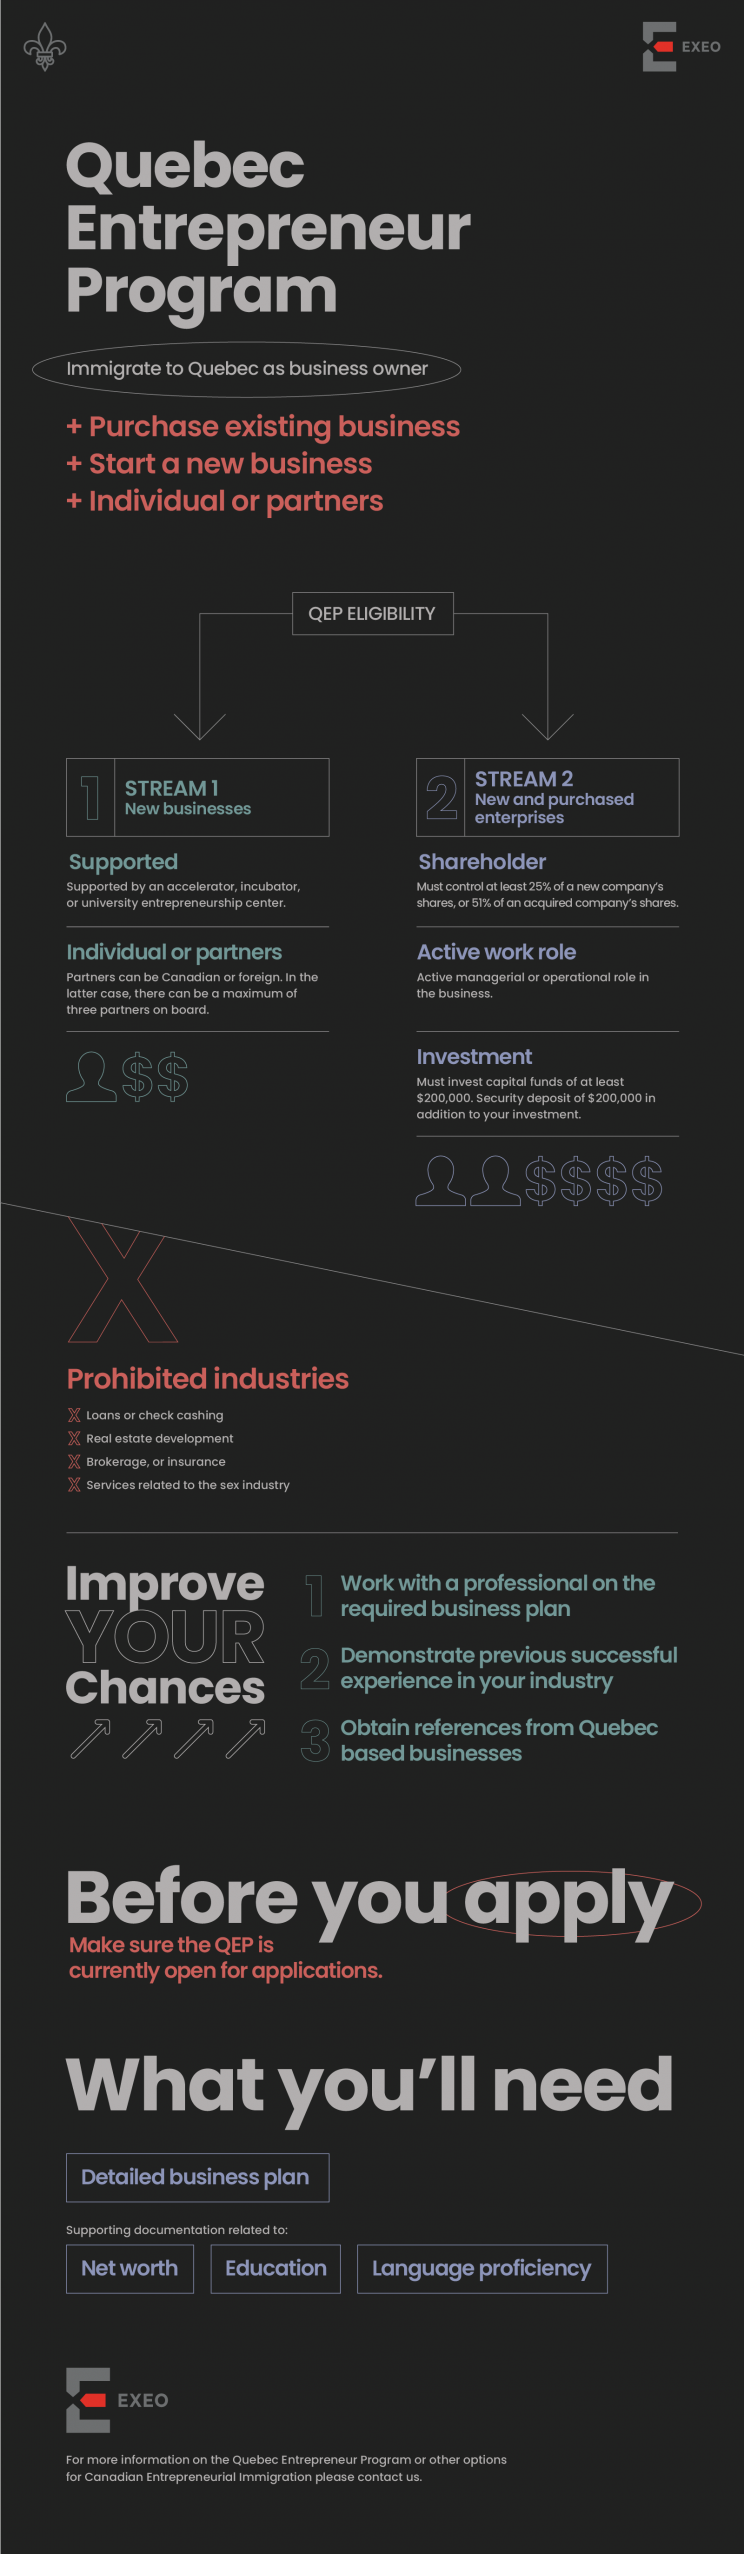 Quebec Entrepreneur Program Infographic